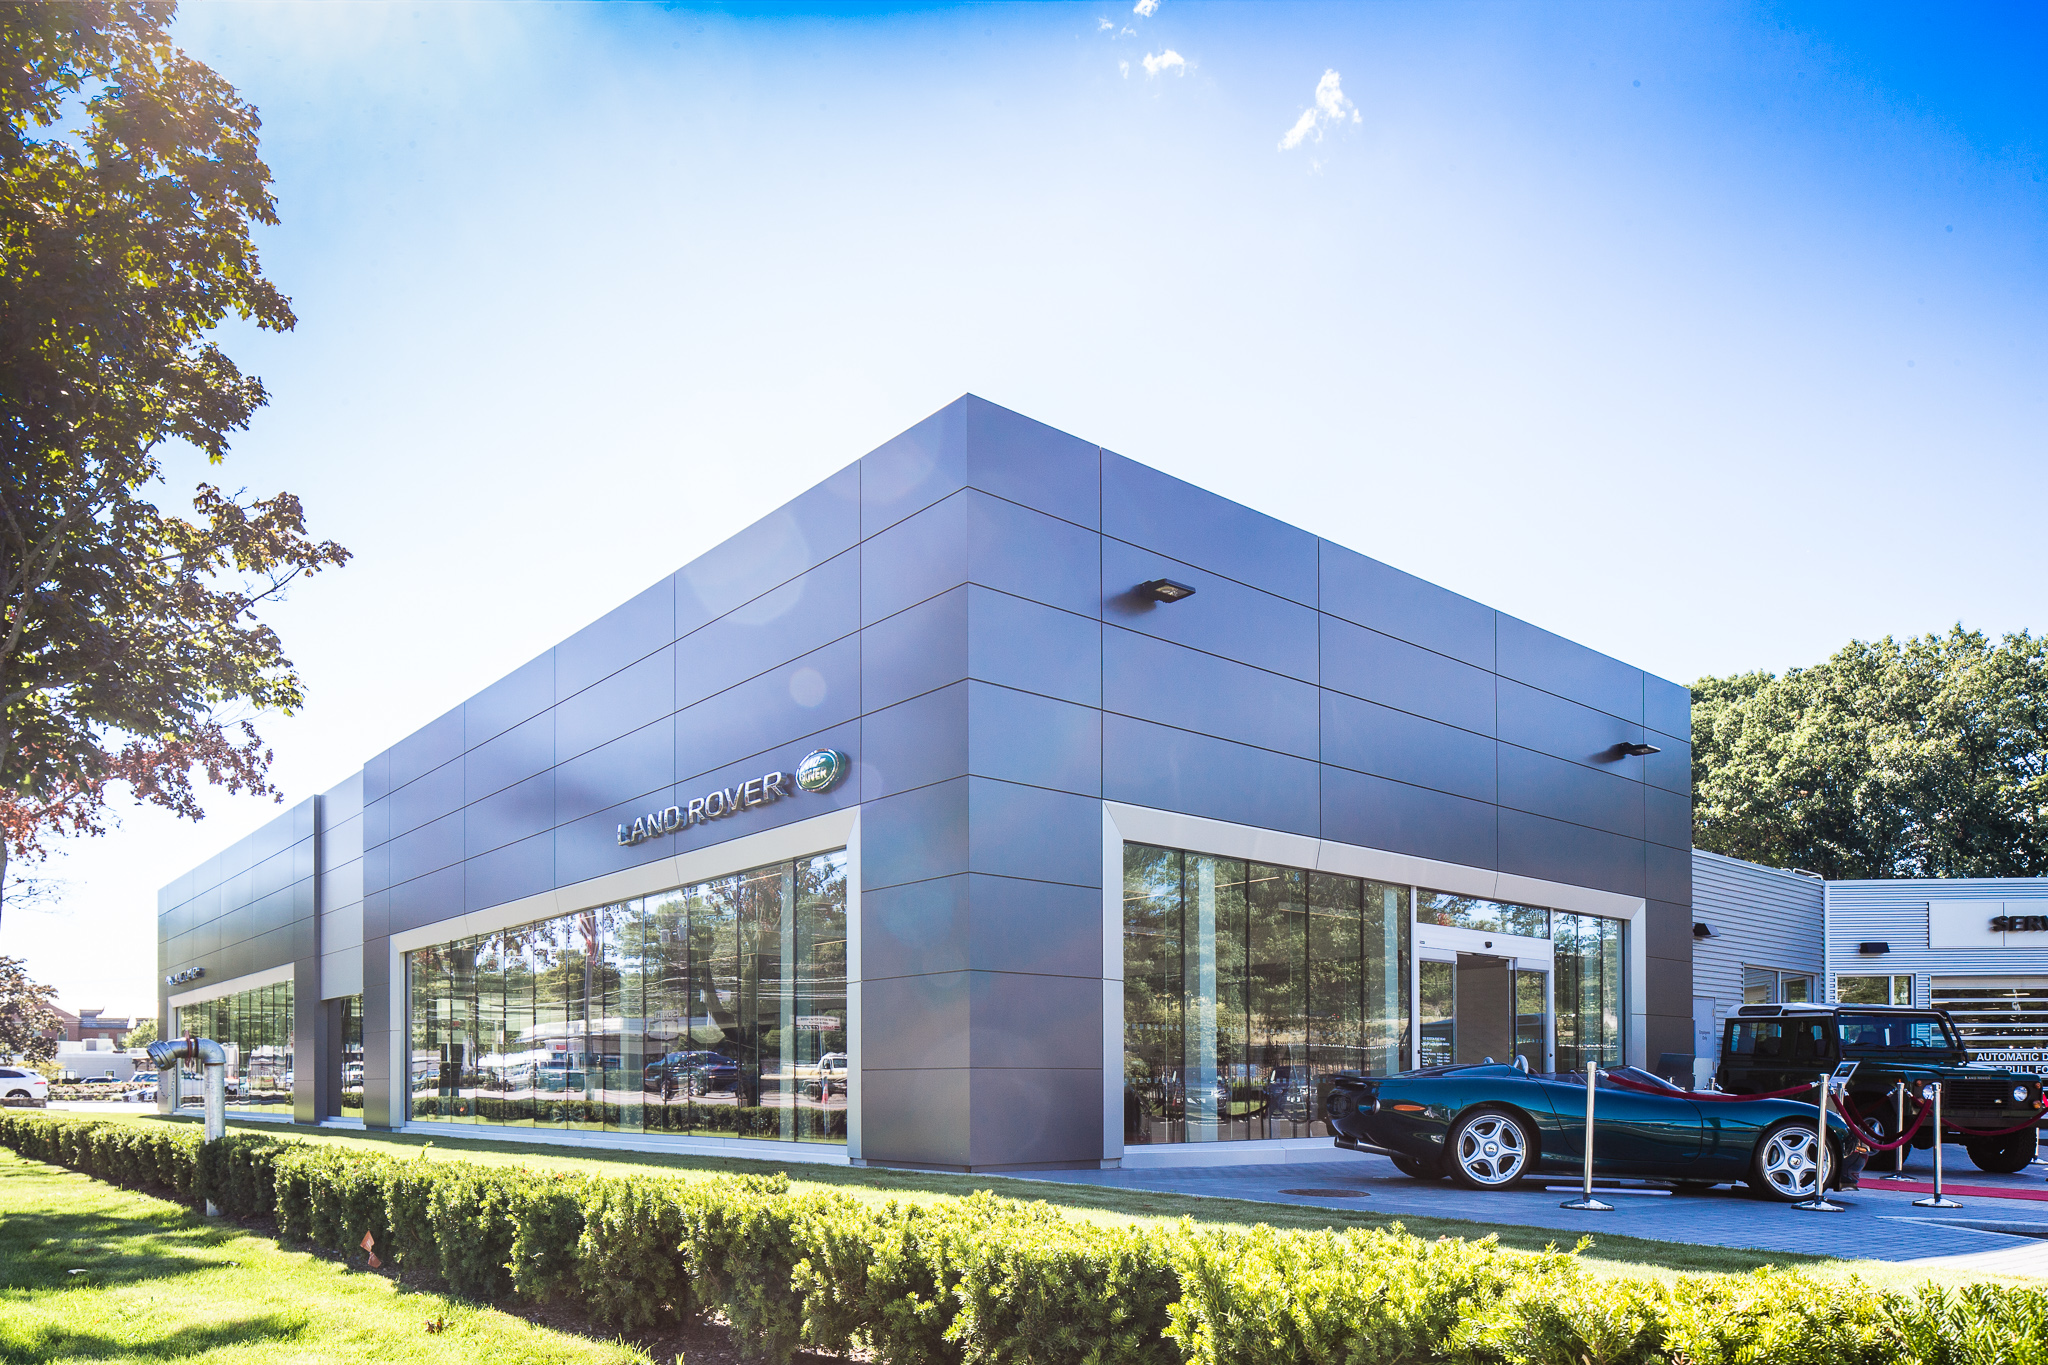 Hyundai Dealers In Ct >> Penske JLR Dealership First to Adopt New Global Design | WardsAuto